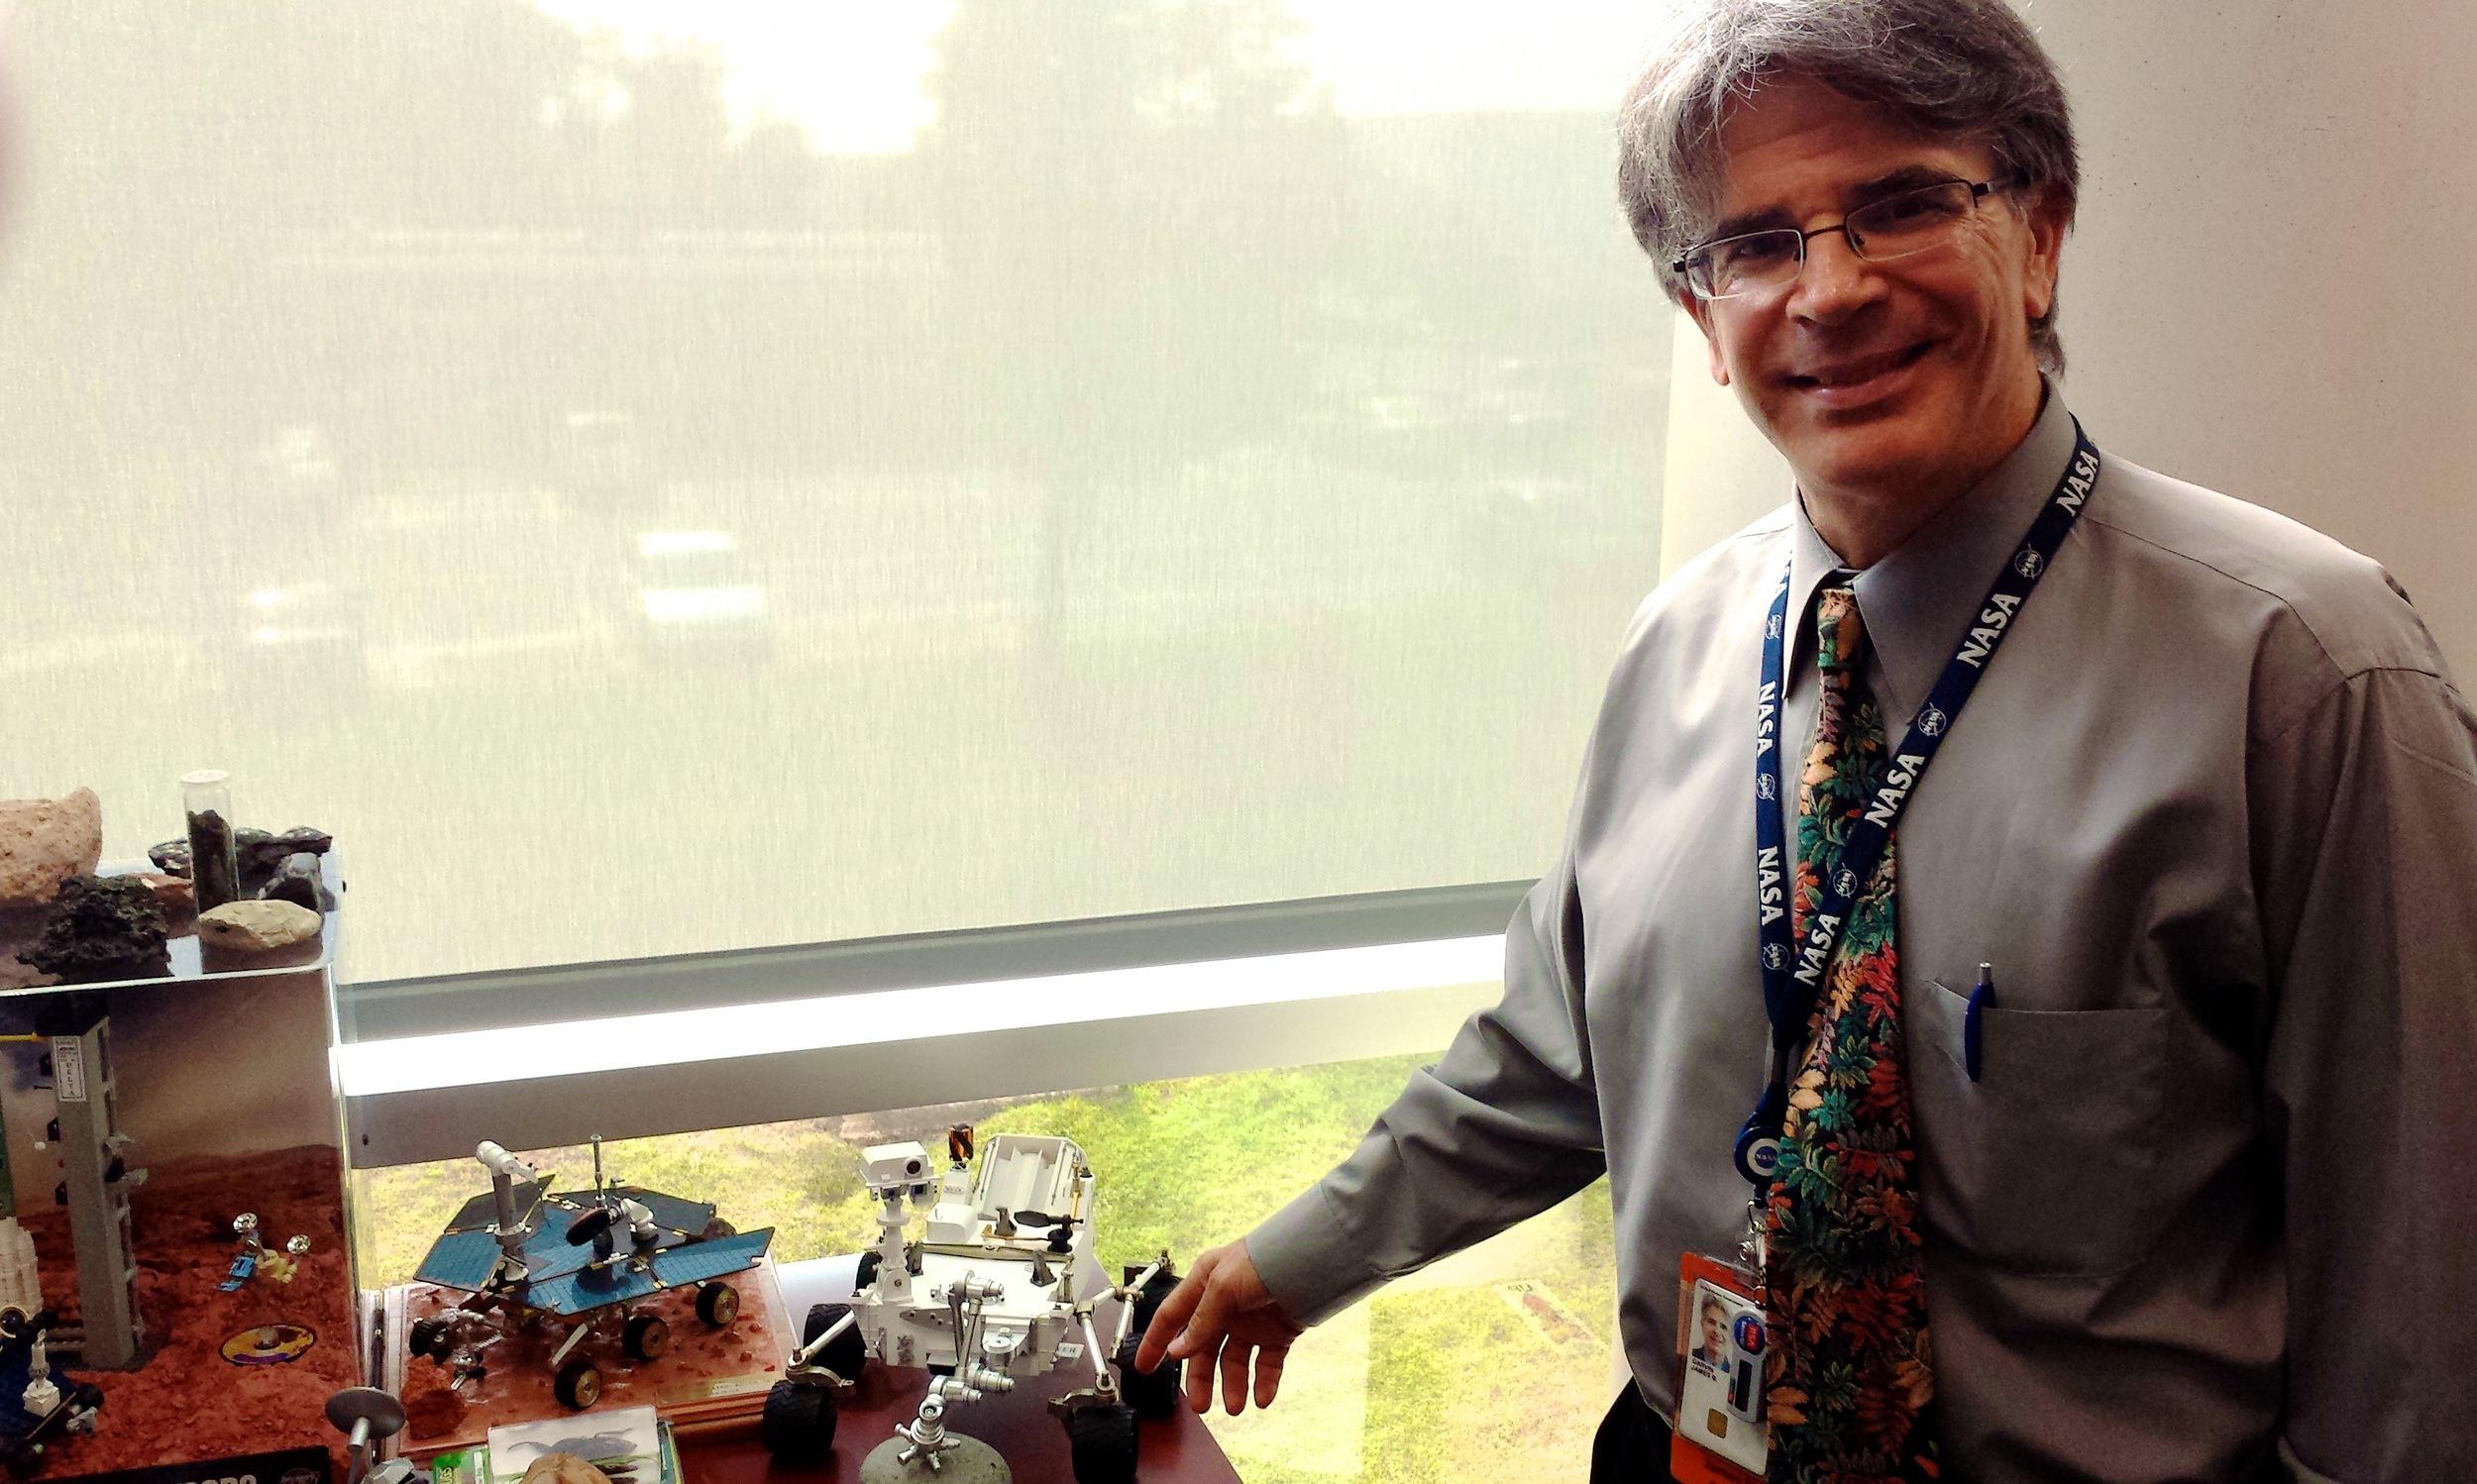 Jim Gavin, Chief Scientist, in his office at Goddard Space Flight Center.